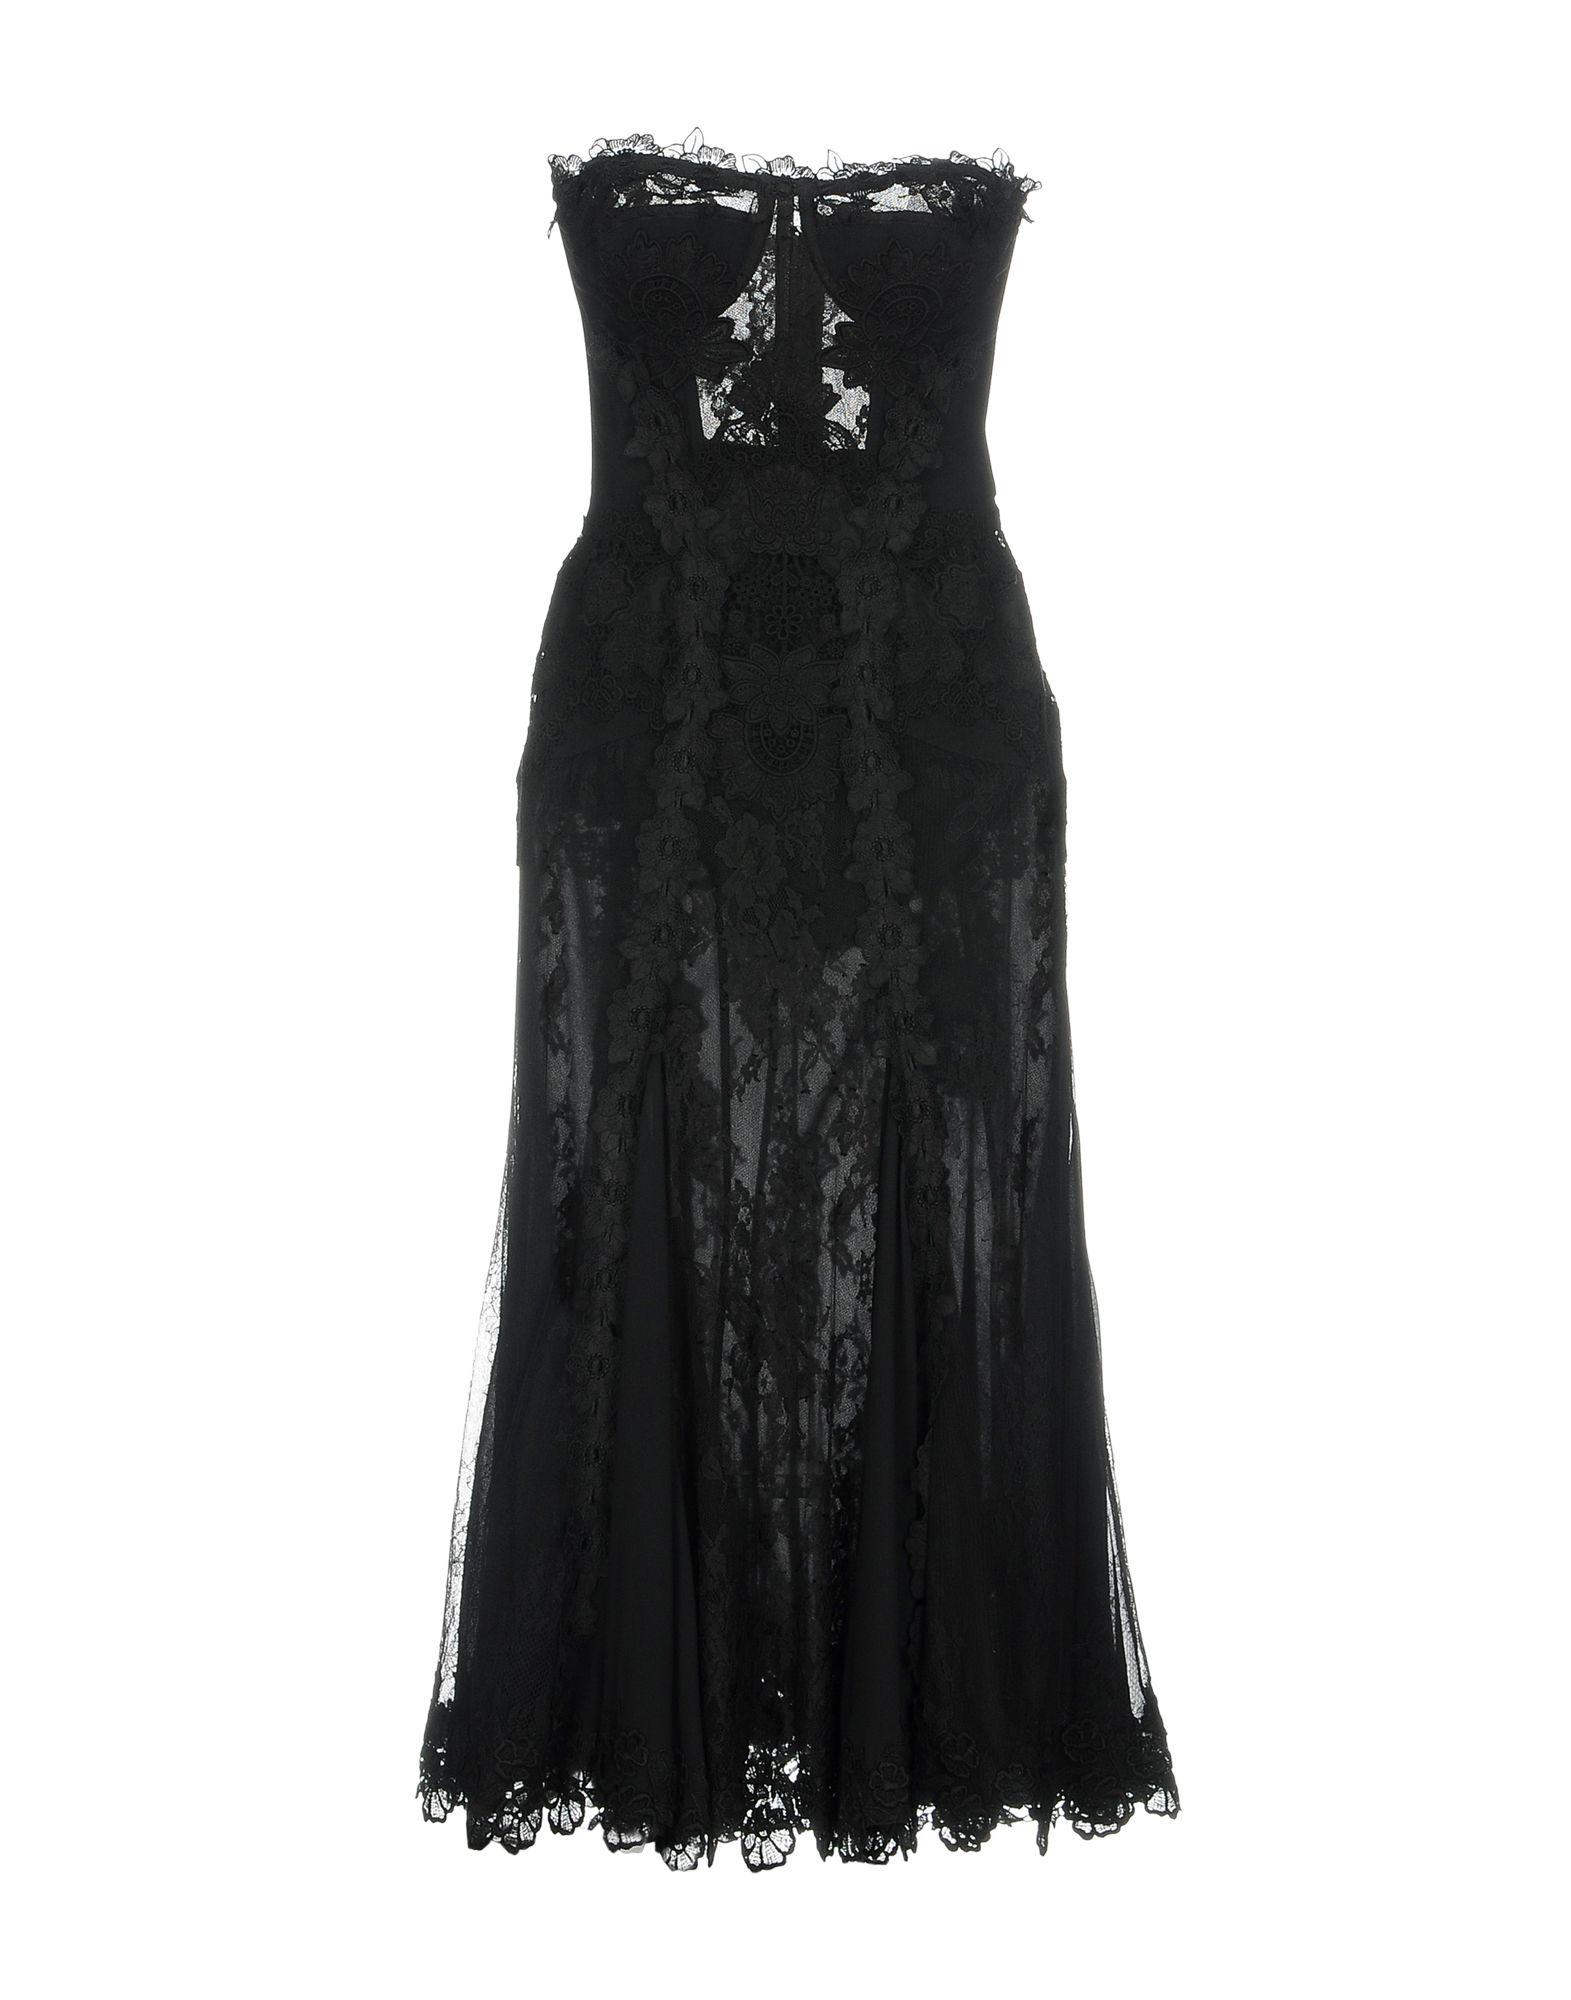 Dolce & Gabbana Knee-Length Dress In Black